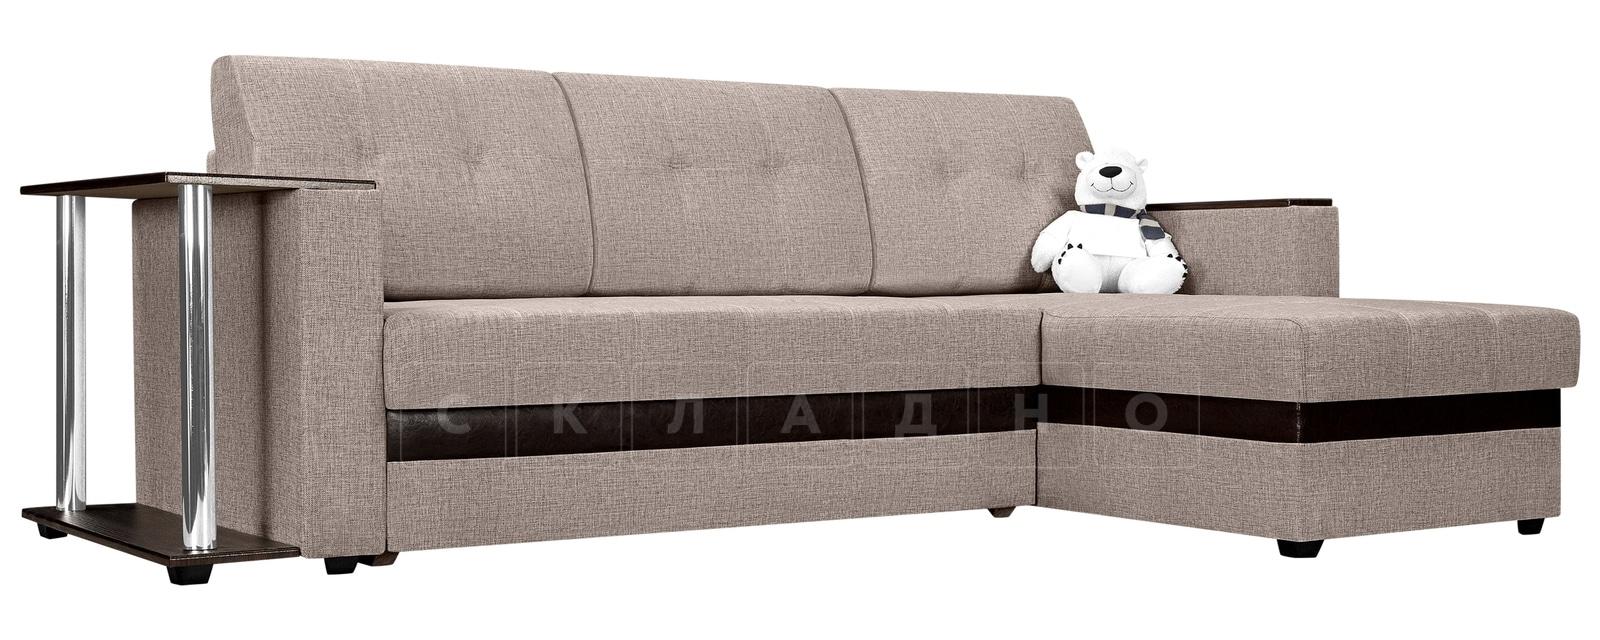 Угловой диван Атланта рогожка темно-бежевого цвета фото 1 | интернет-магазин Складно